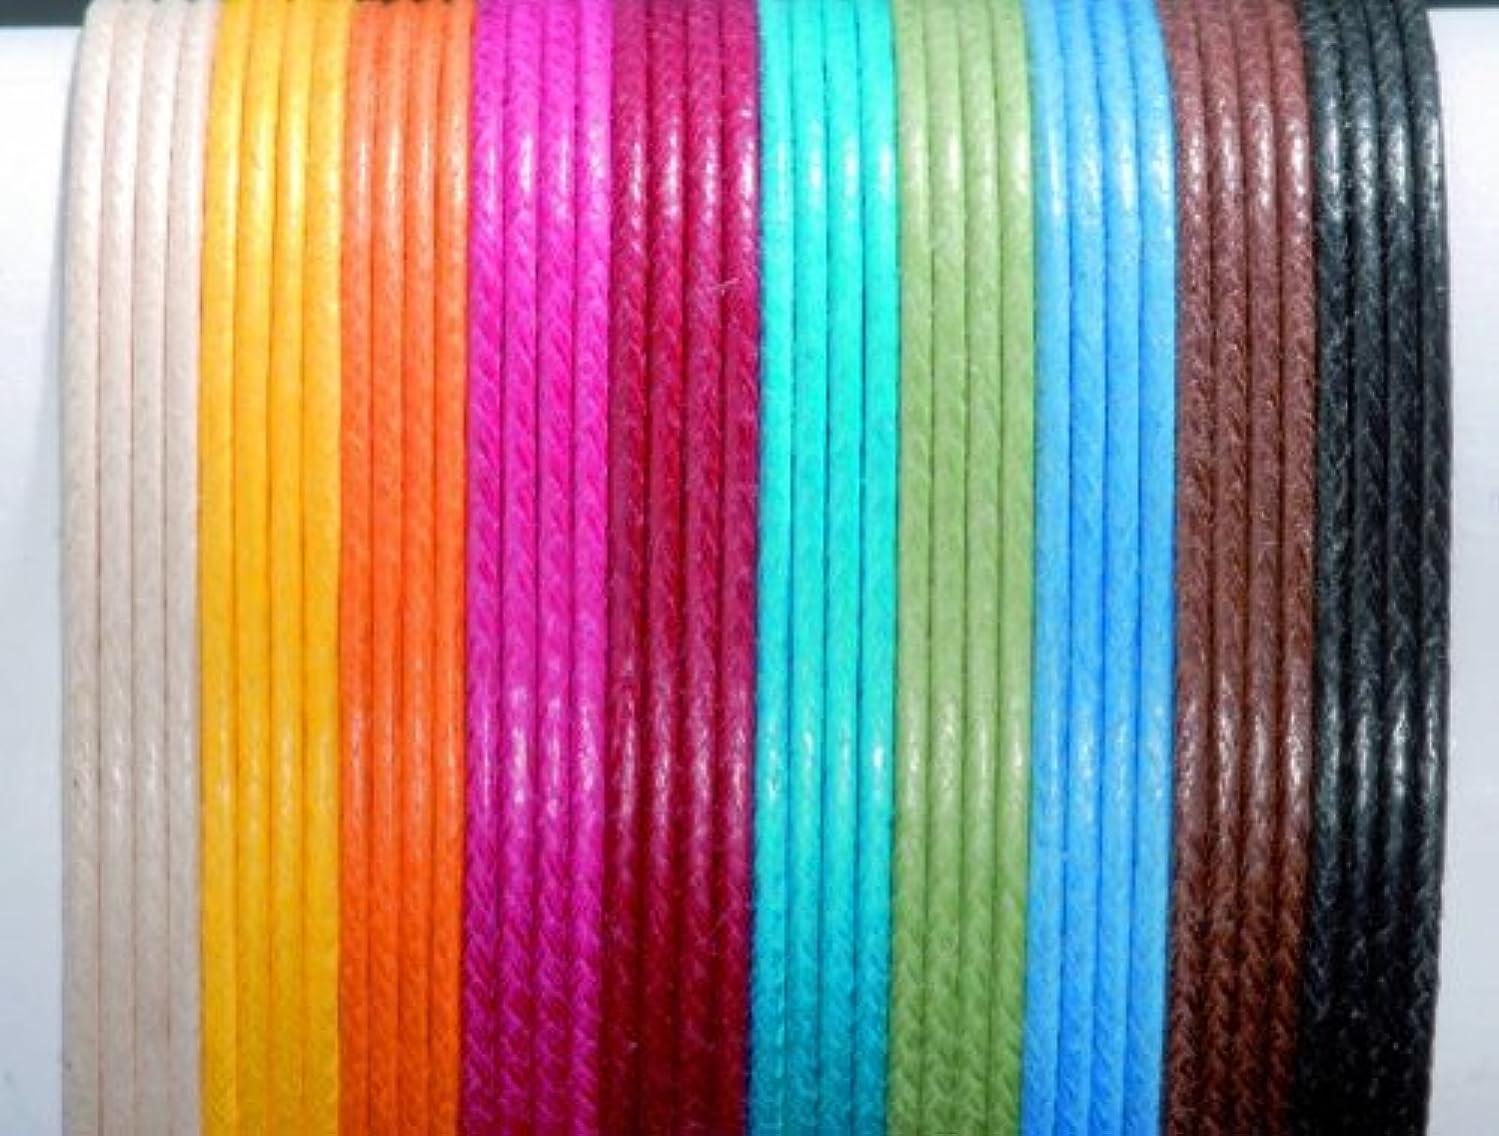 Glorex Cotton Wax Cord 1?mm/5?m, Cotton, Black, 8.5?x 5.5?x 1?cm